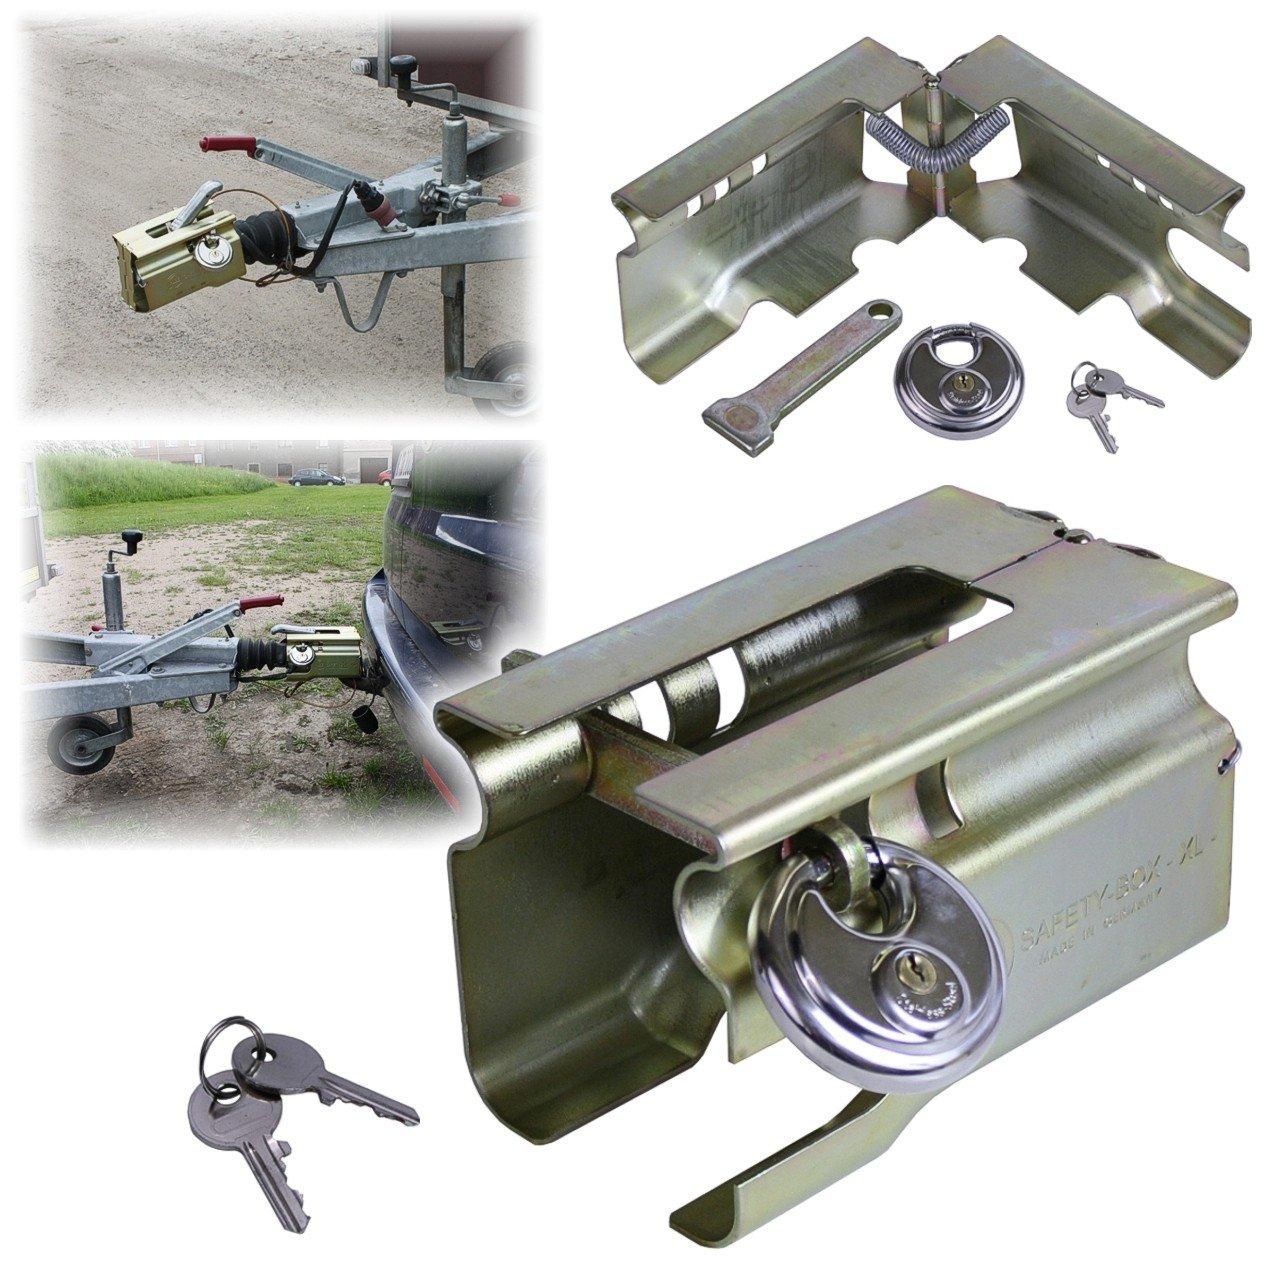 Caja de seguridad Albe Berndes XL + Candado antirrobo para remolque de automó viles